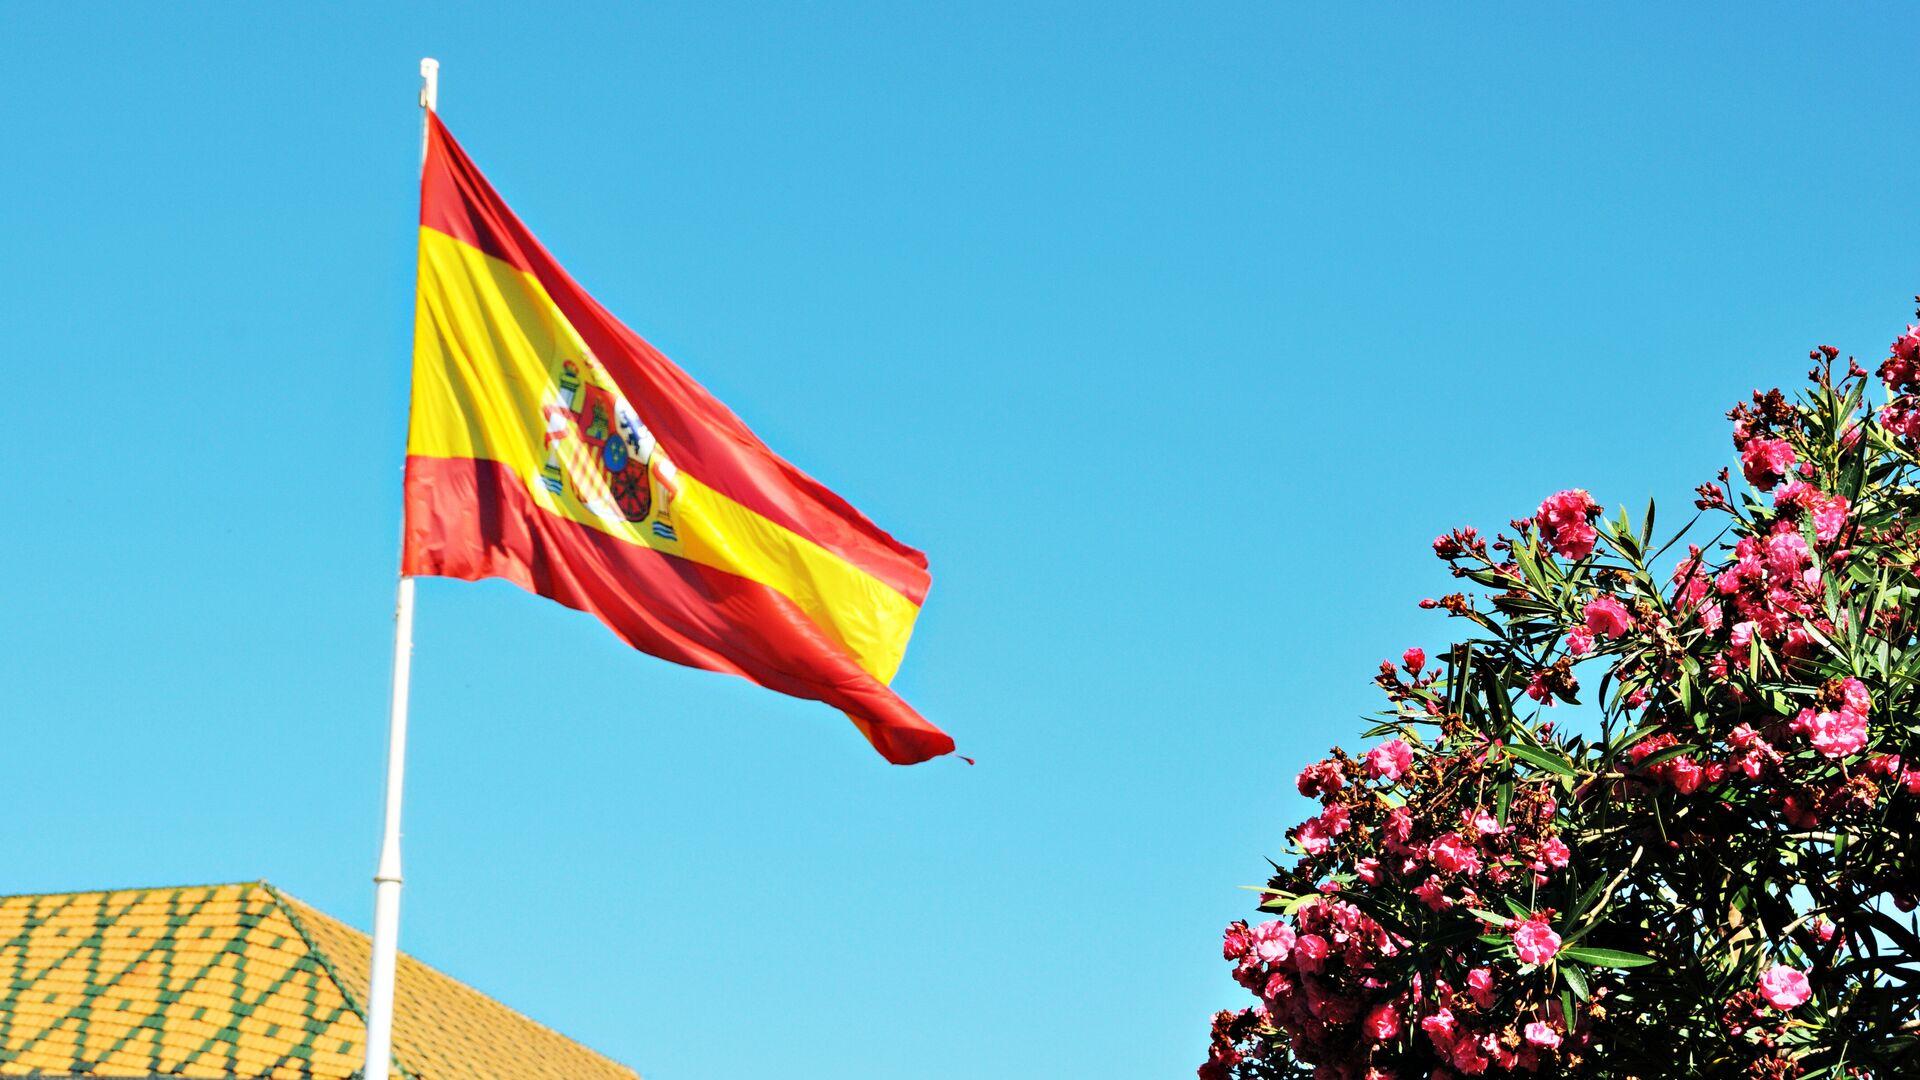 Bandera de España - Sputnik Mundo, 1920, 08.10.2021